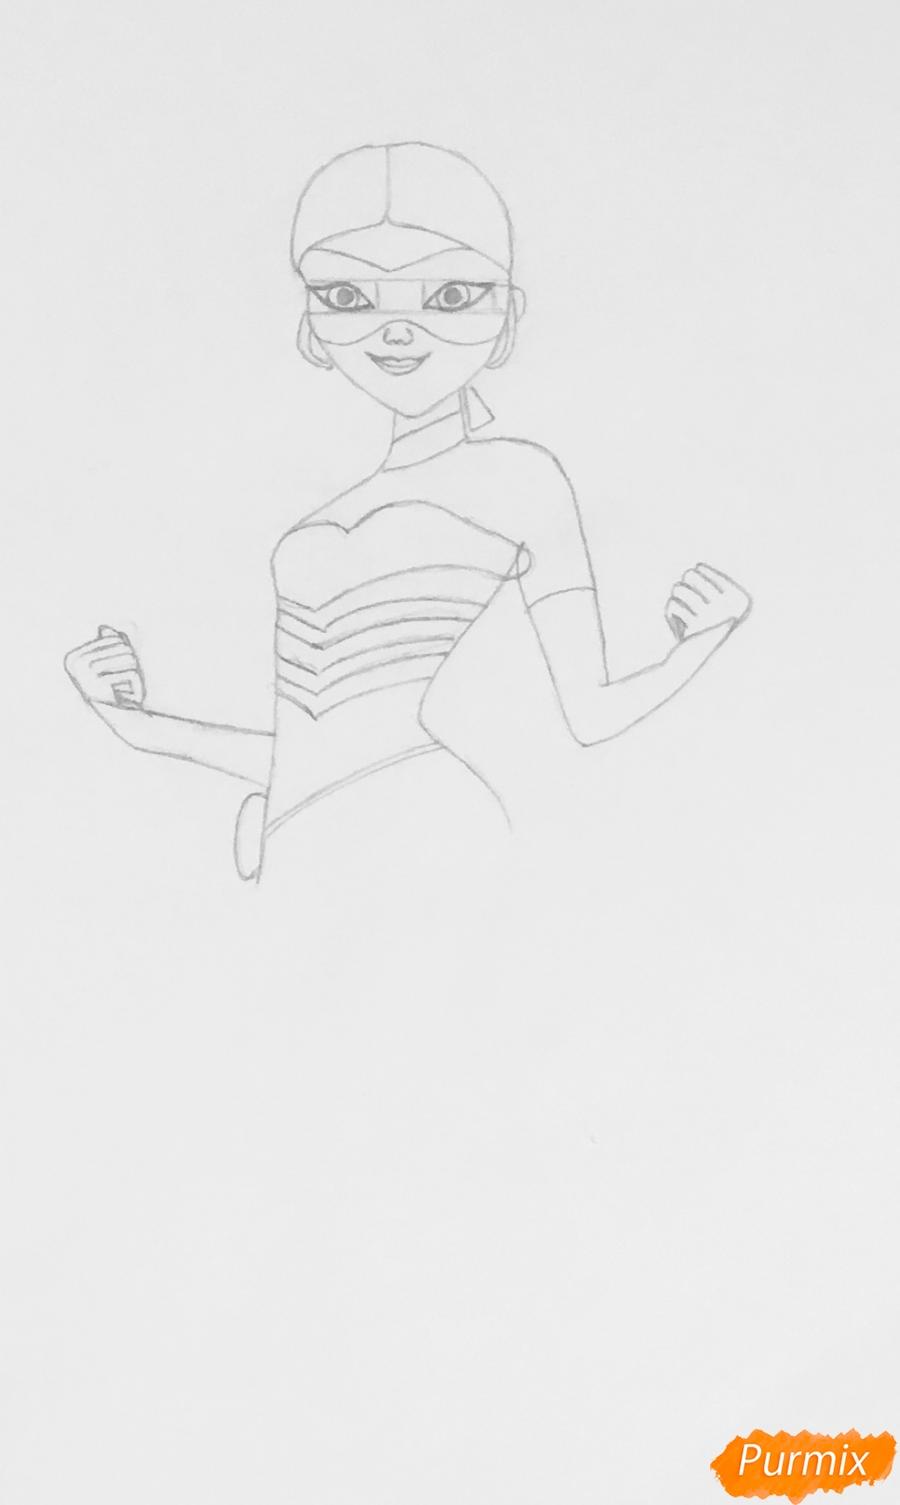 Рисуем Хлою пчелу из мультфильма Леди Баг и Супер Кот - фото 3